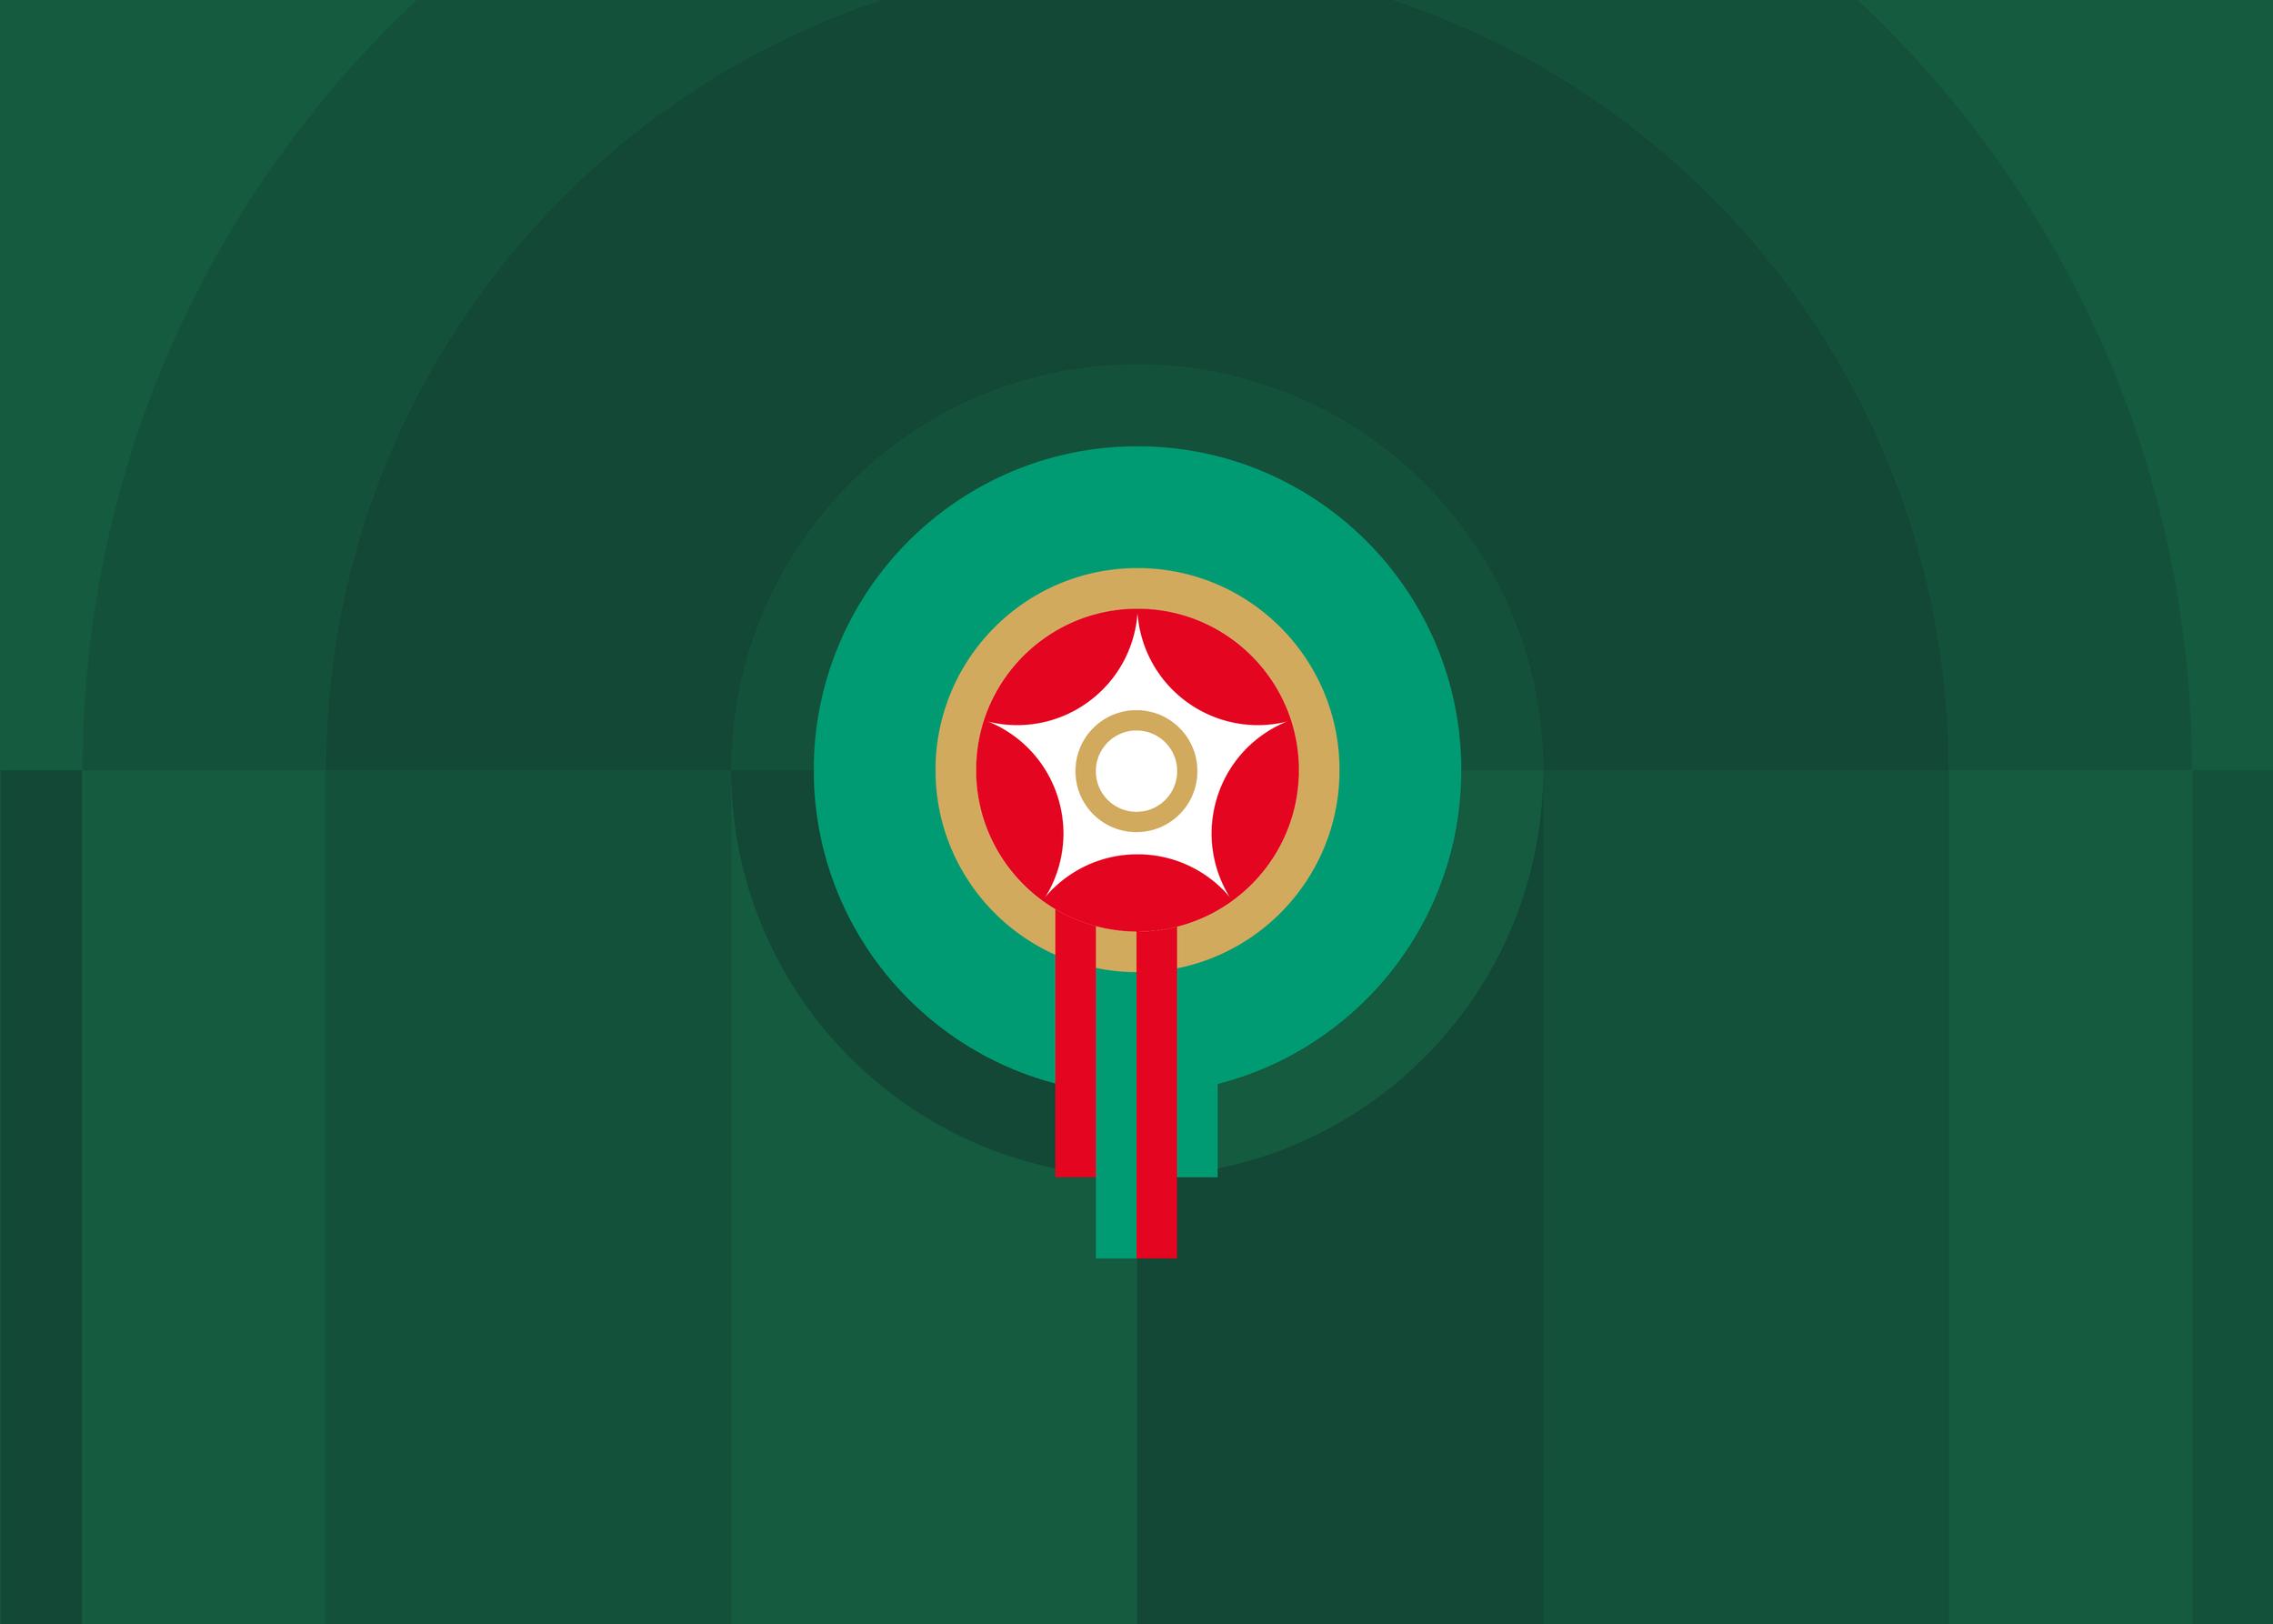 Morocco-Geometric-World-Cup-Football-Badge-01-Logo-Design-Freelance-Kent.png